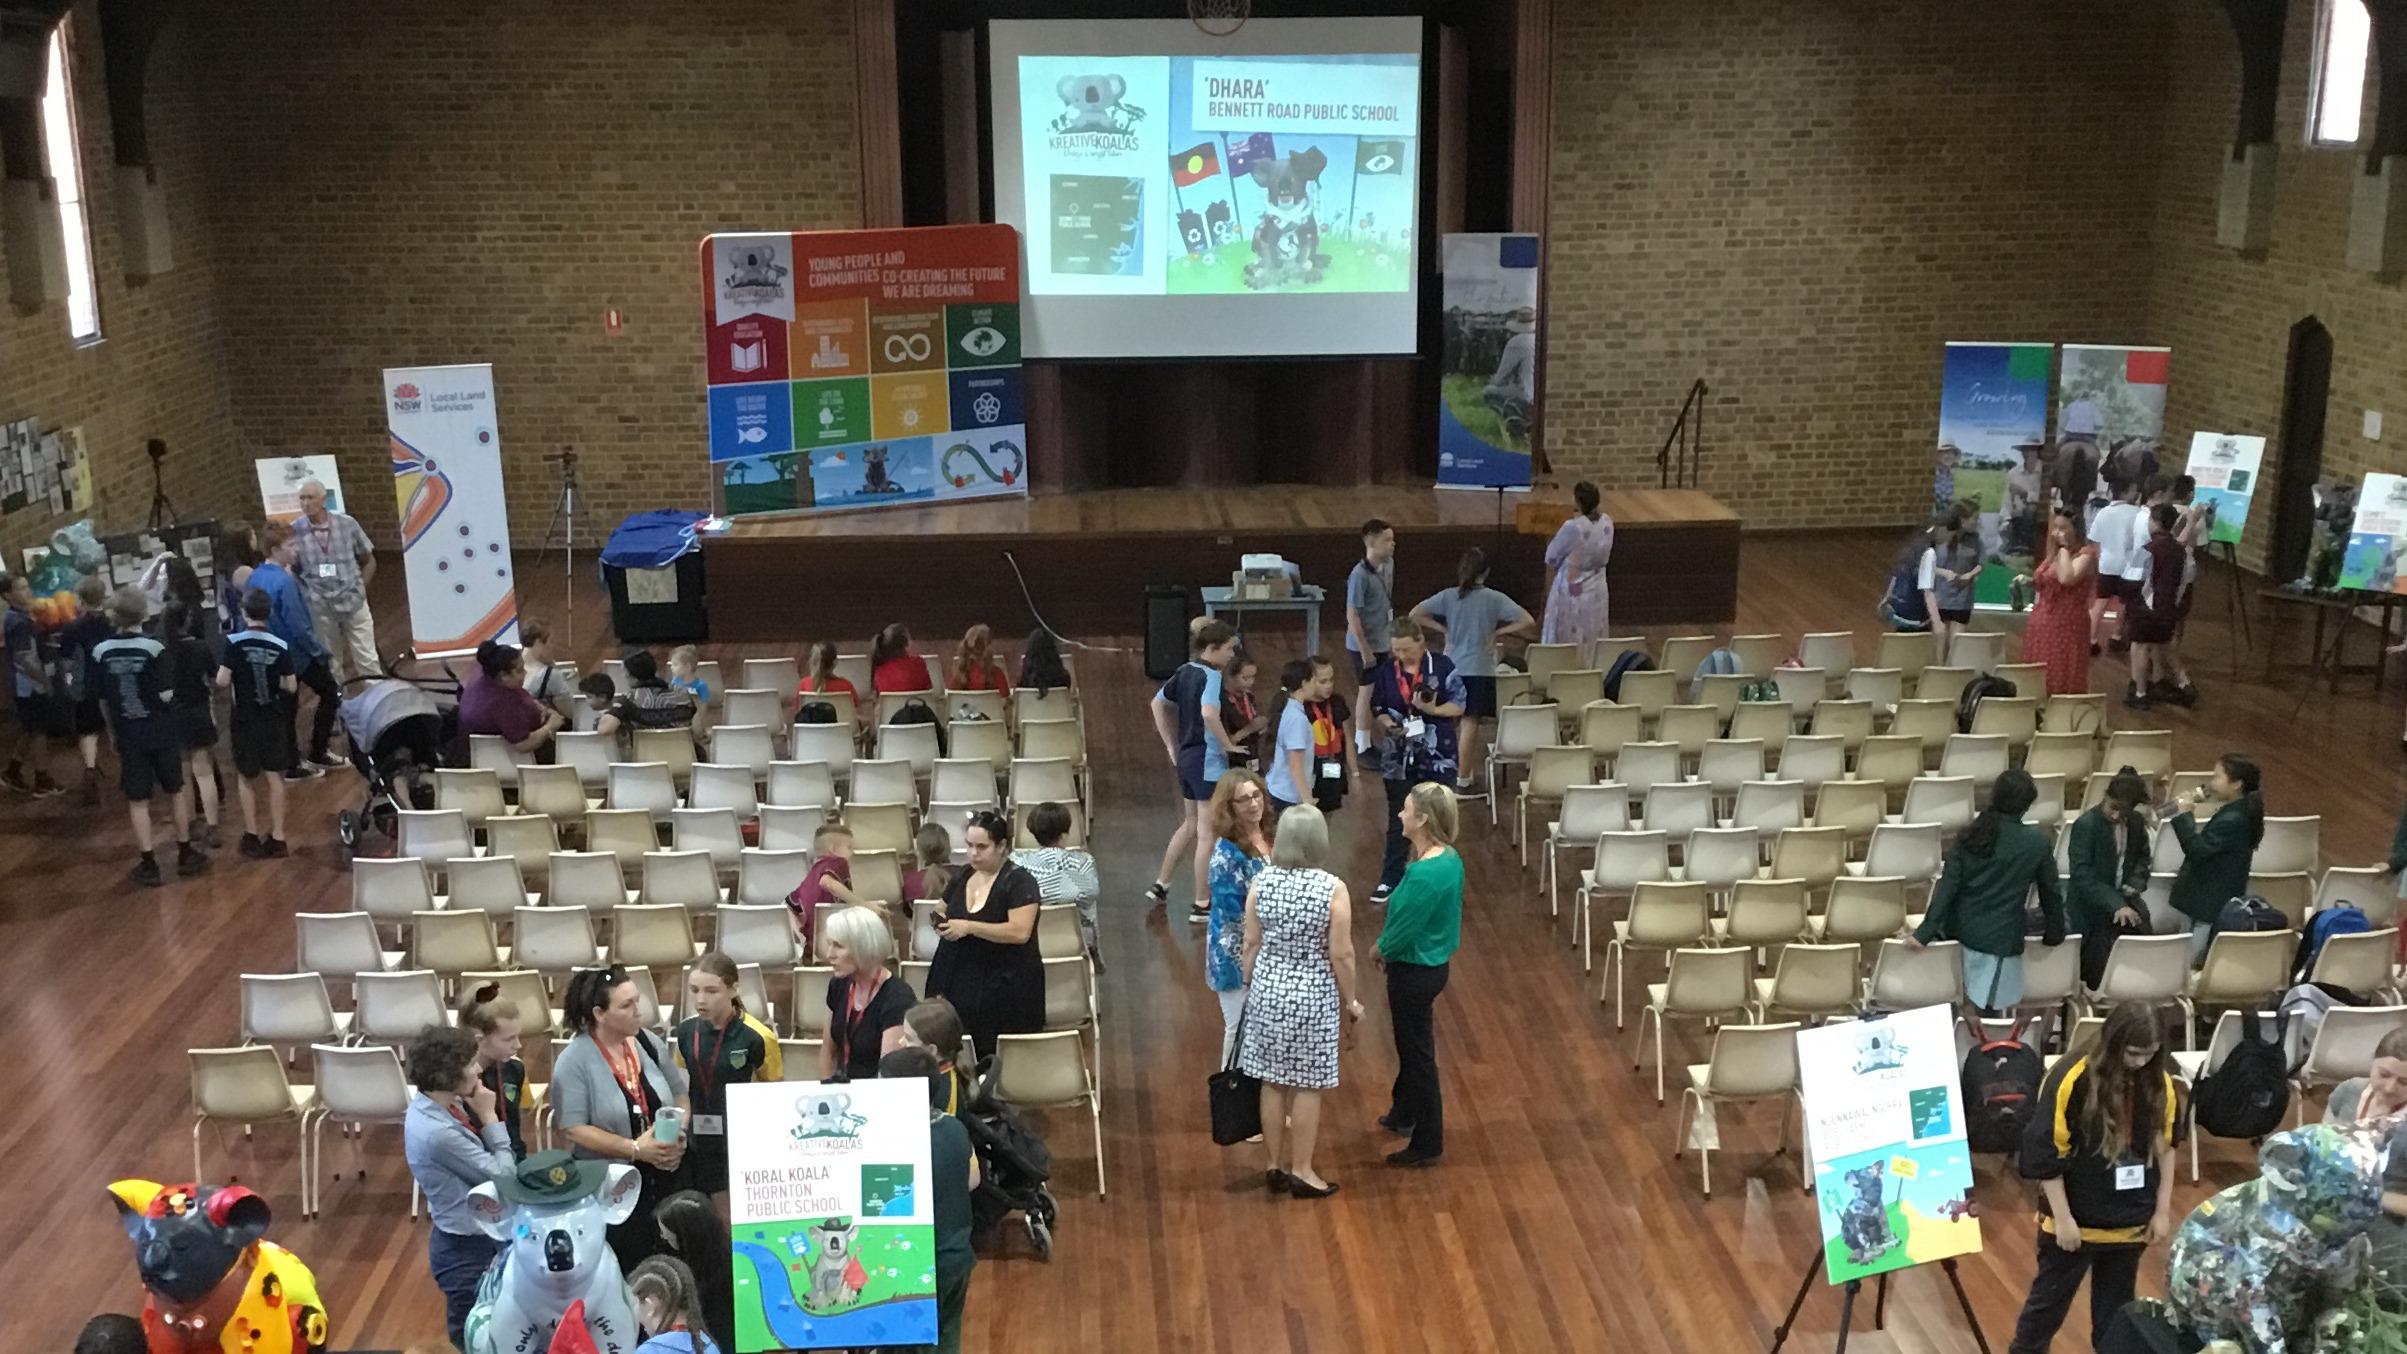 Hall set up for Kreative Koalas event